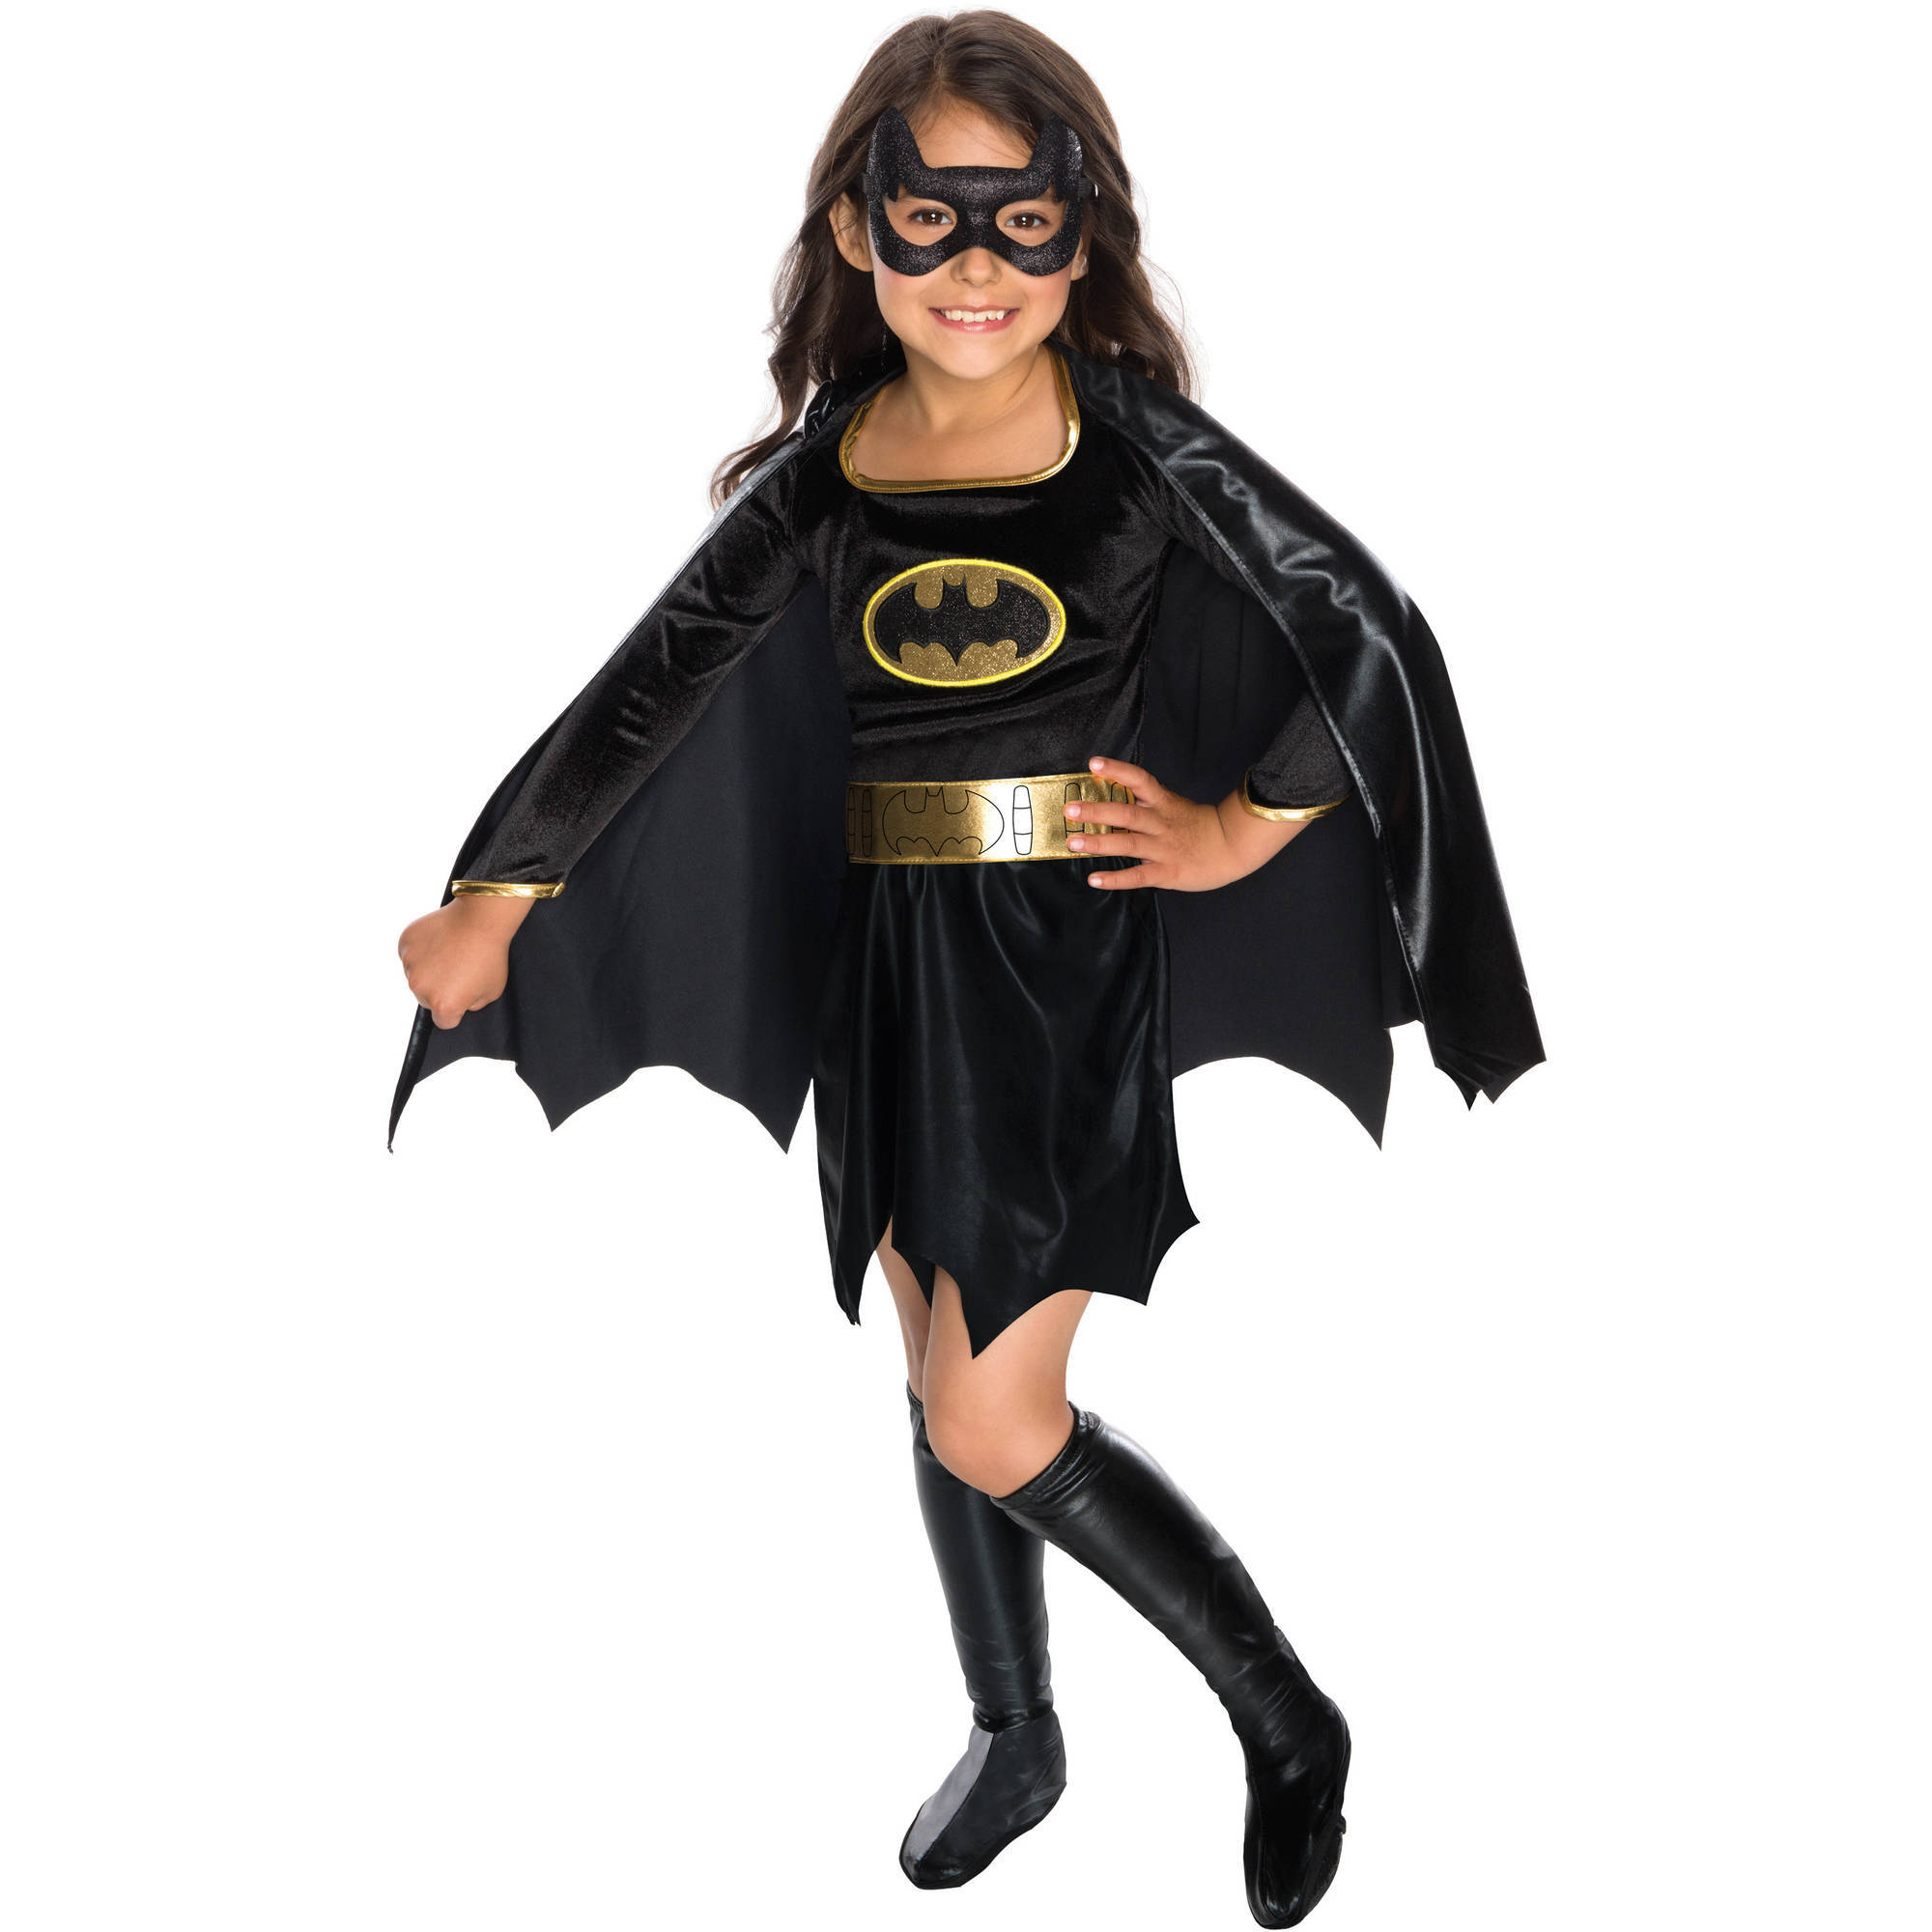 Batrgirl Child Velvet Deluxe Dress Halloween Costume